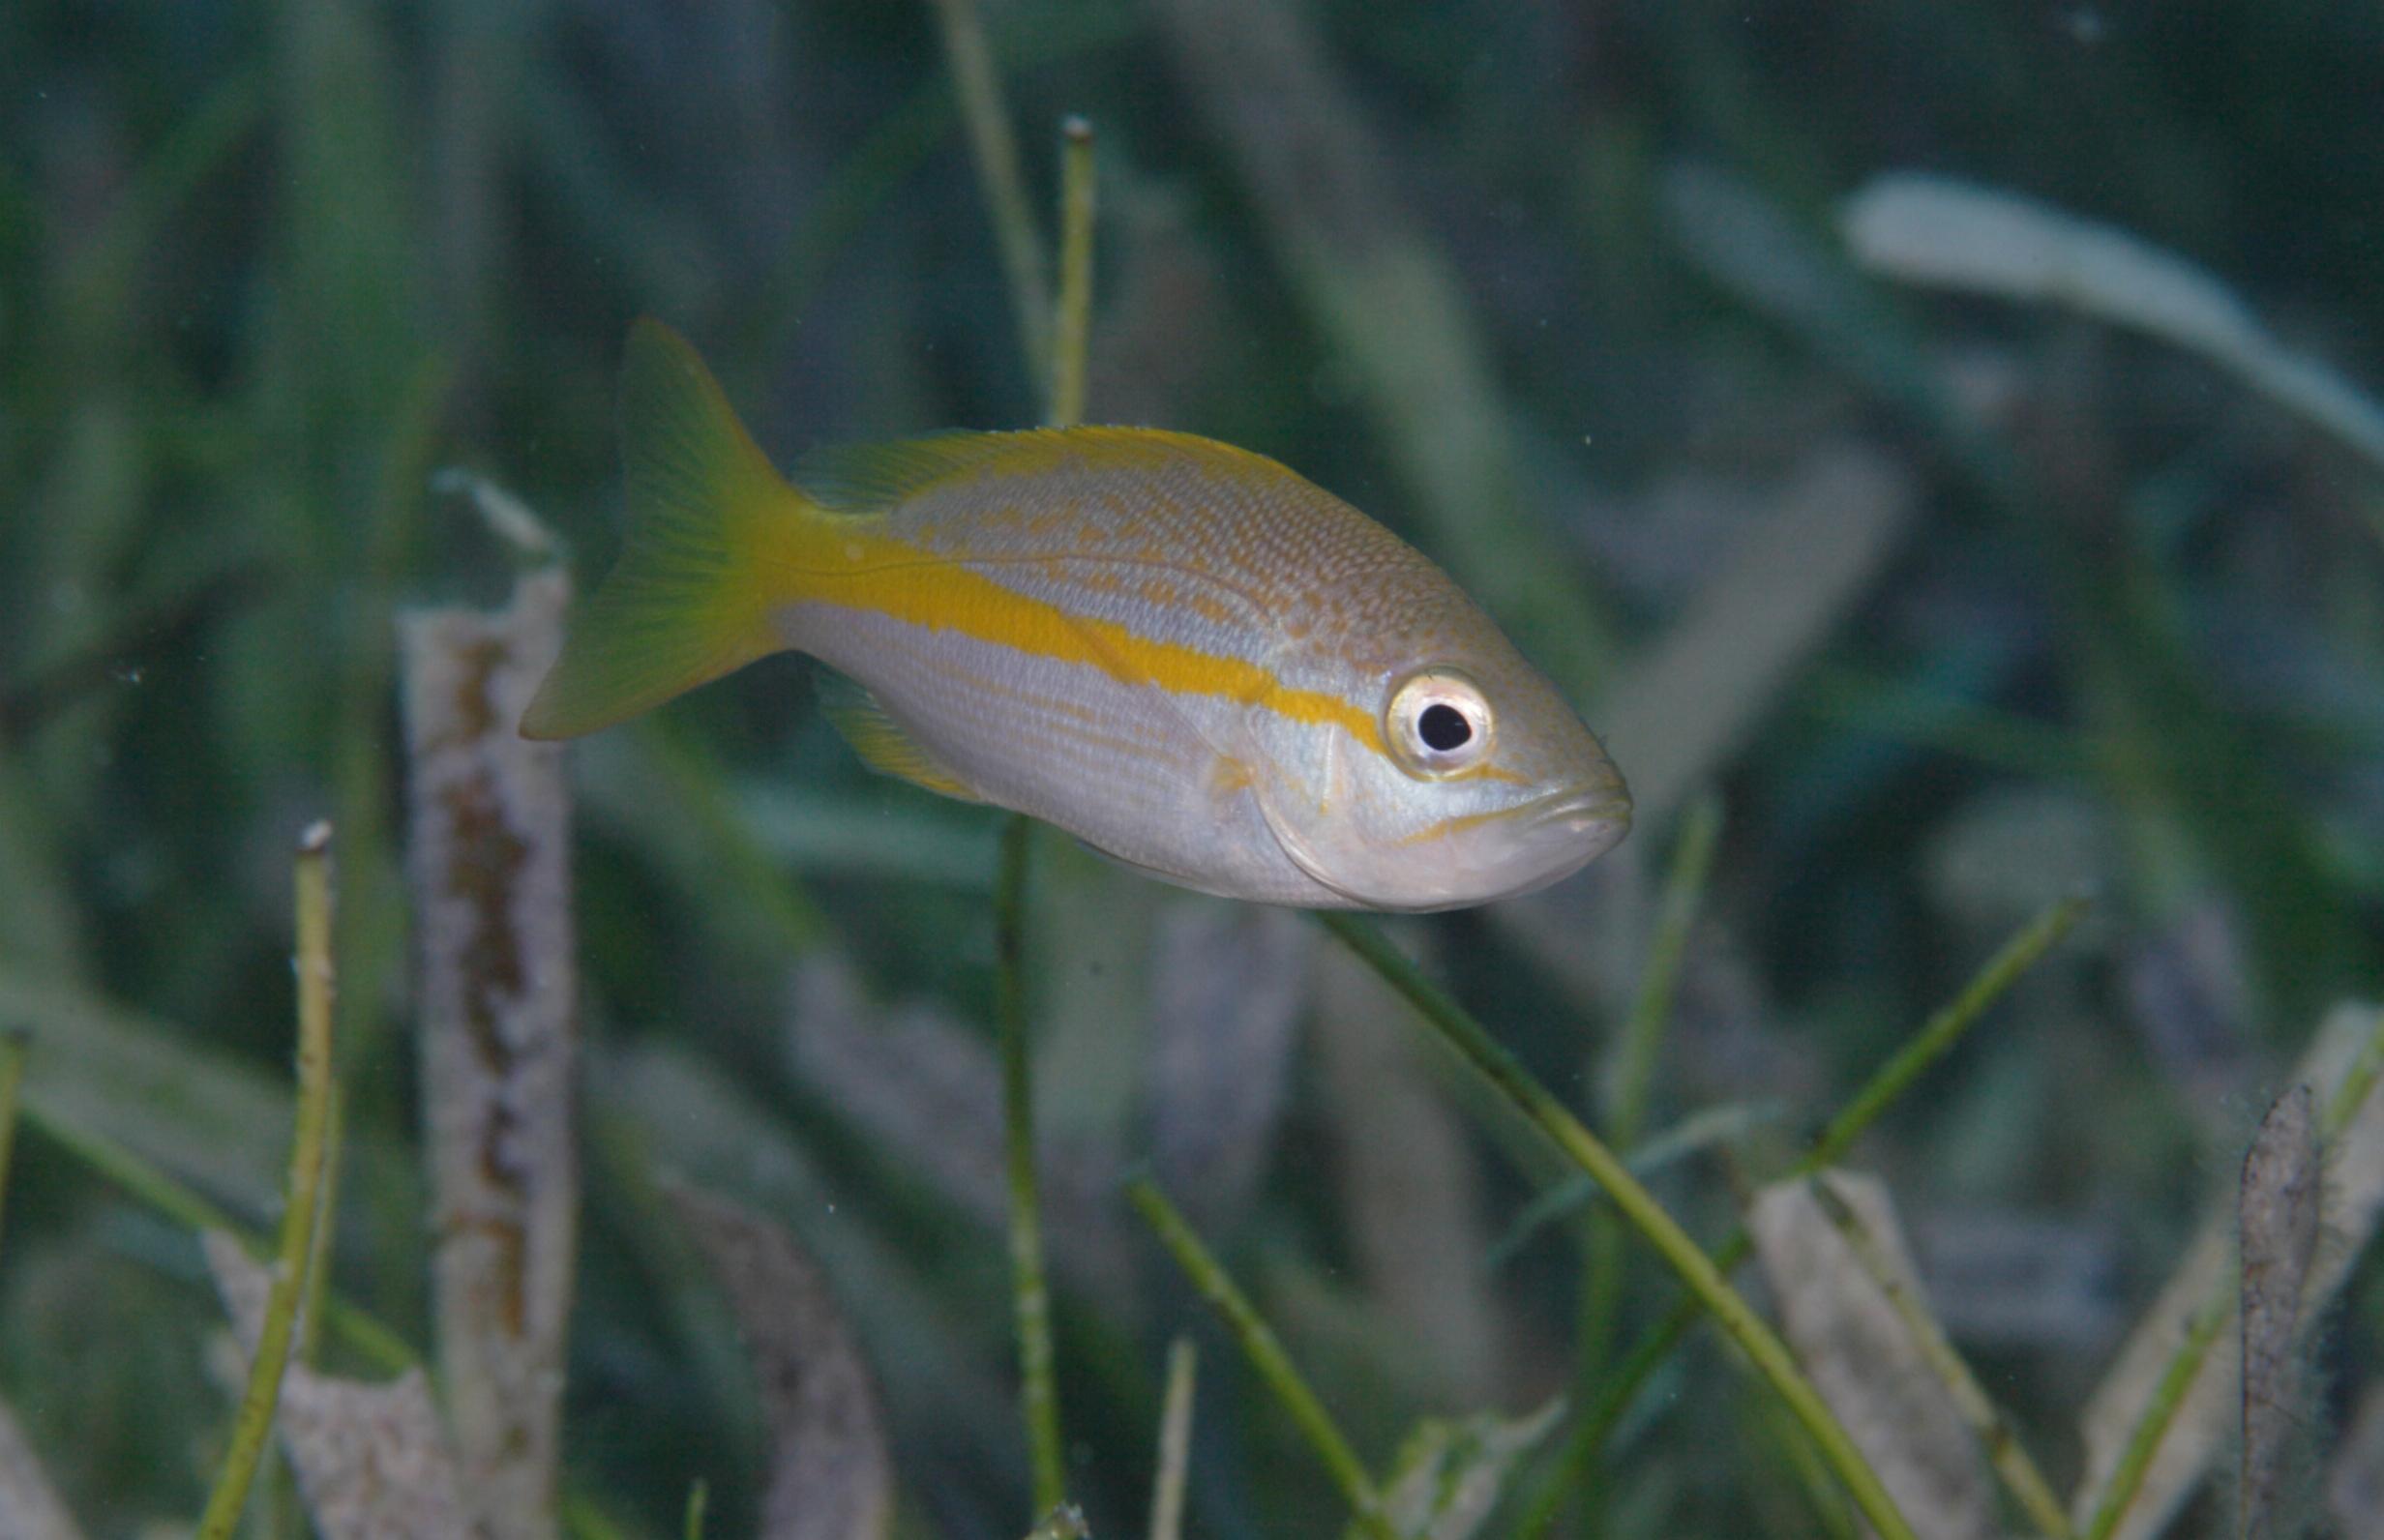 yellowtail fish in seagrass